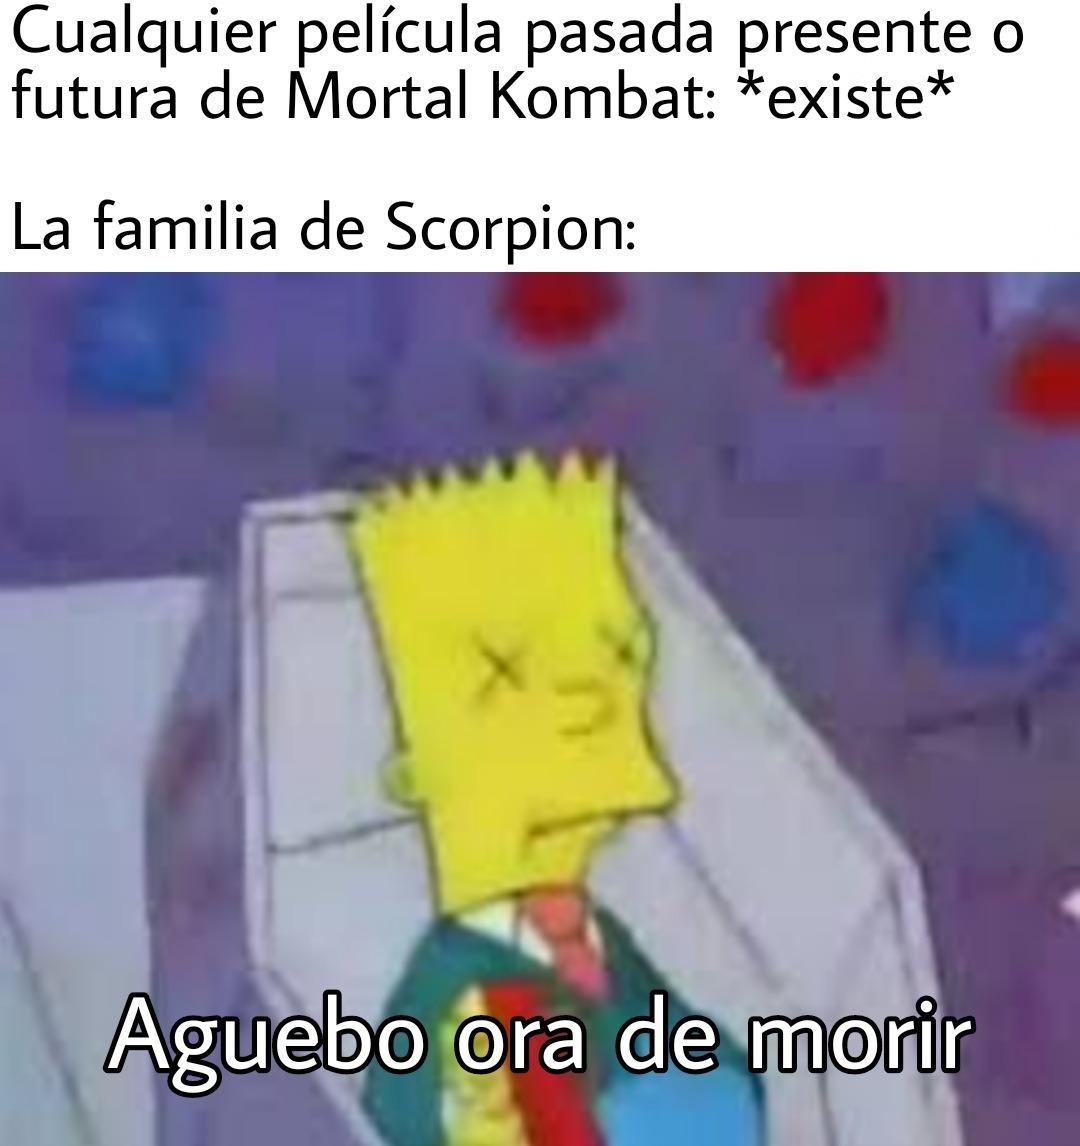 Ya entendimos Scorpion es un personaje trágico - meme